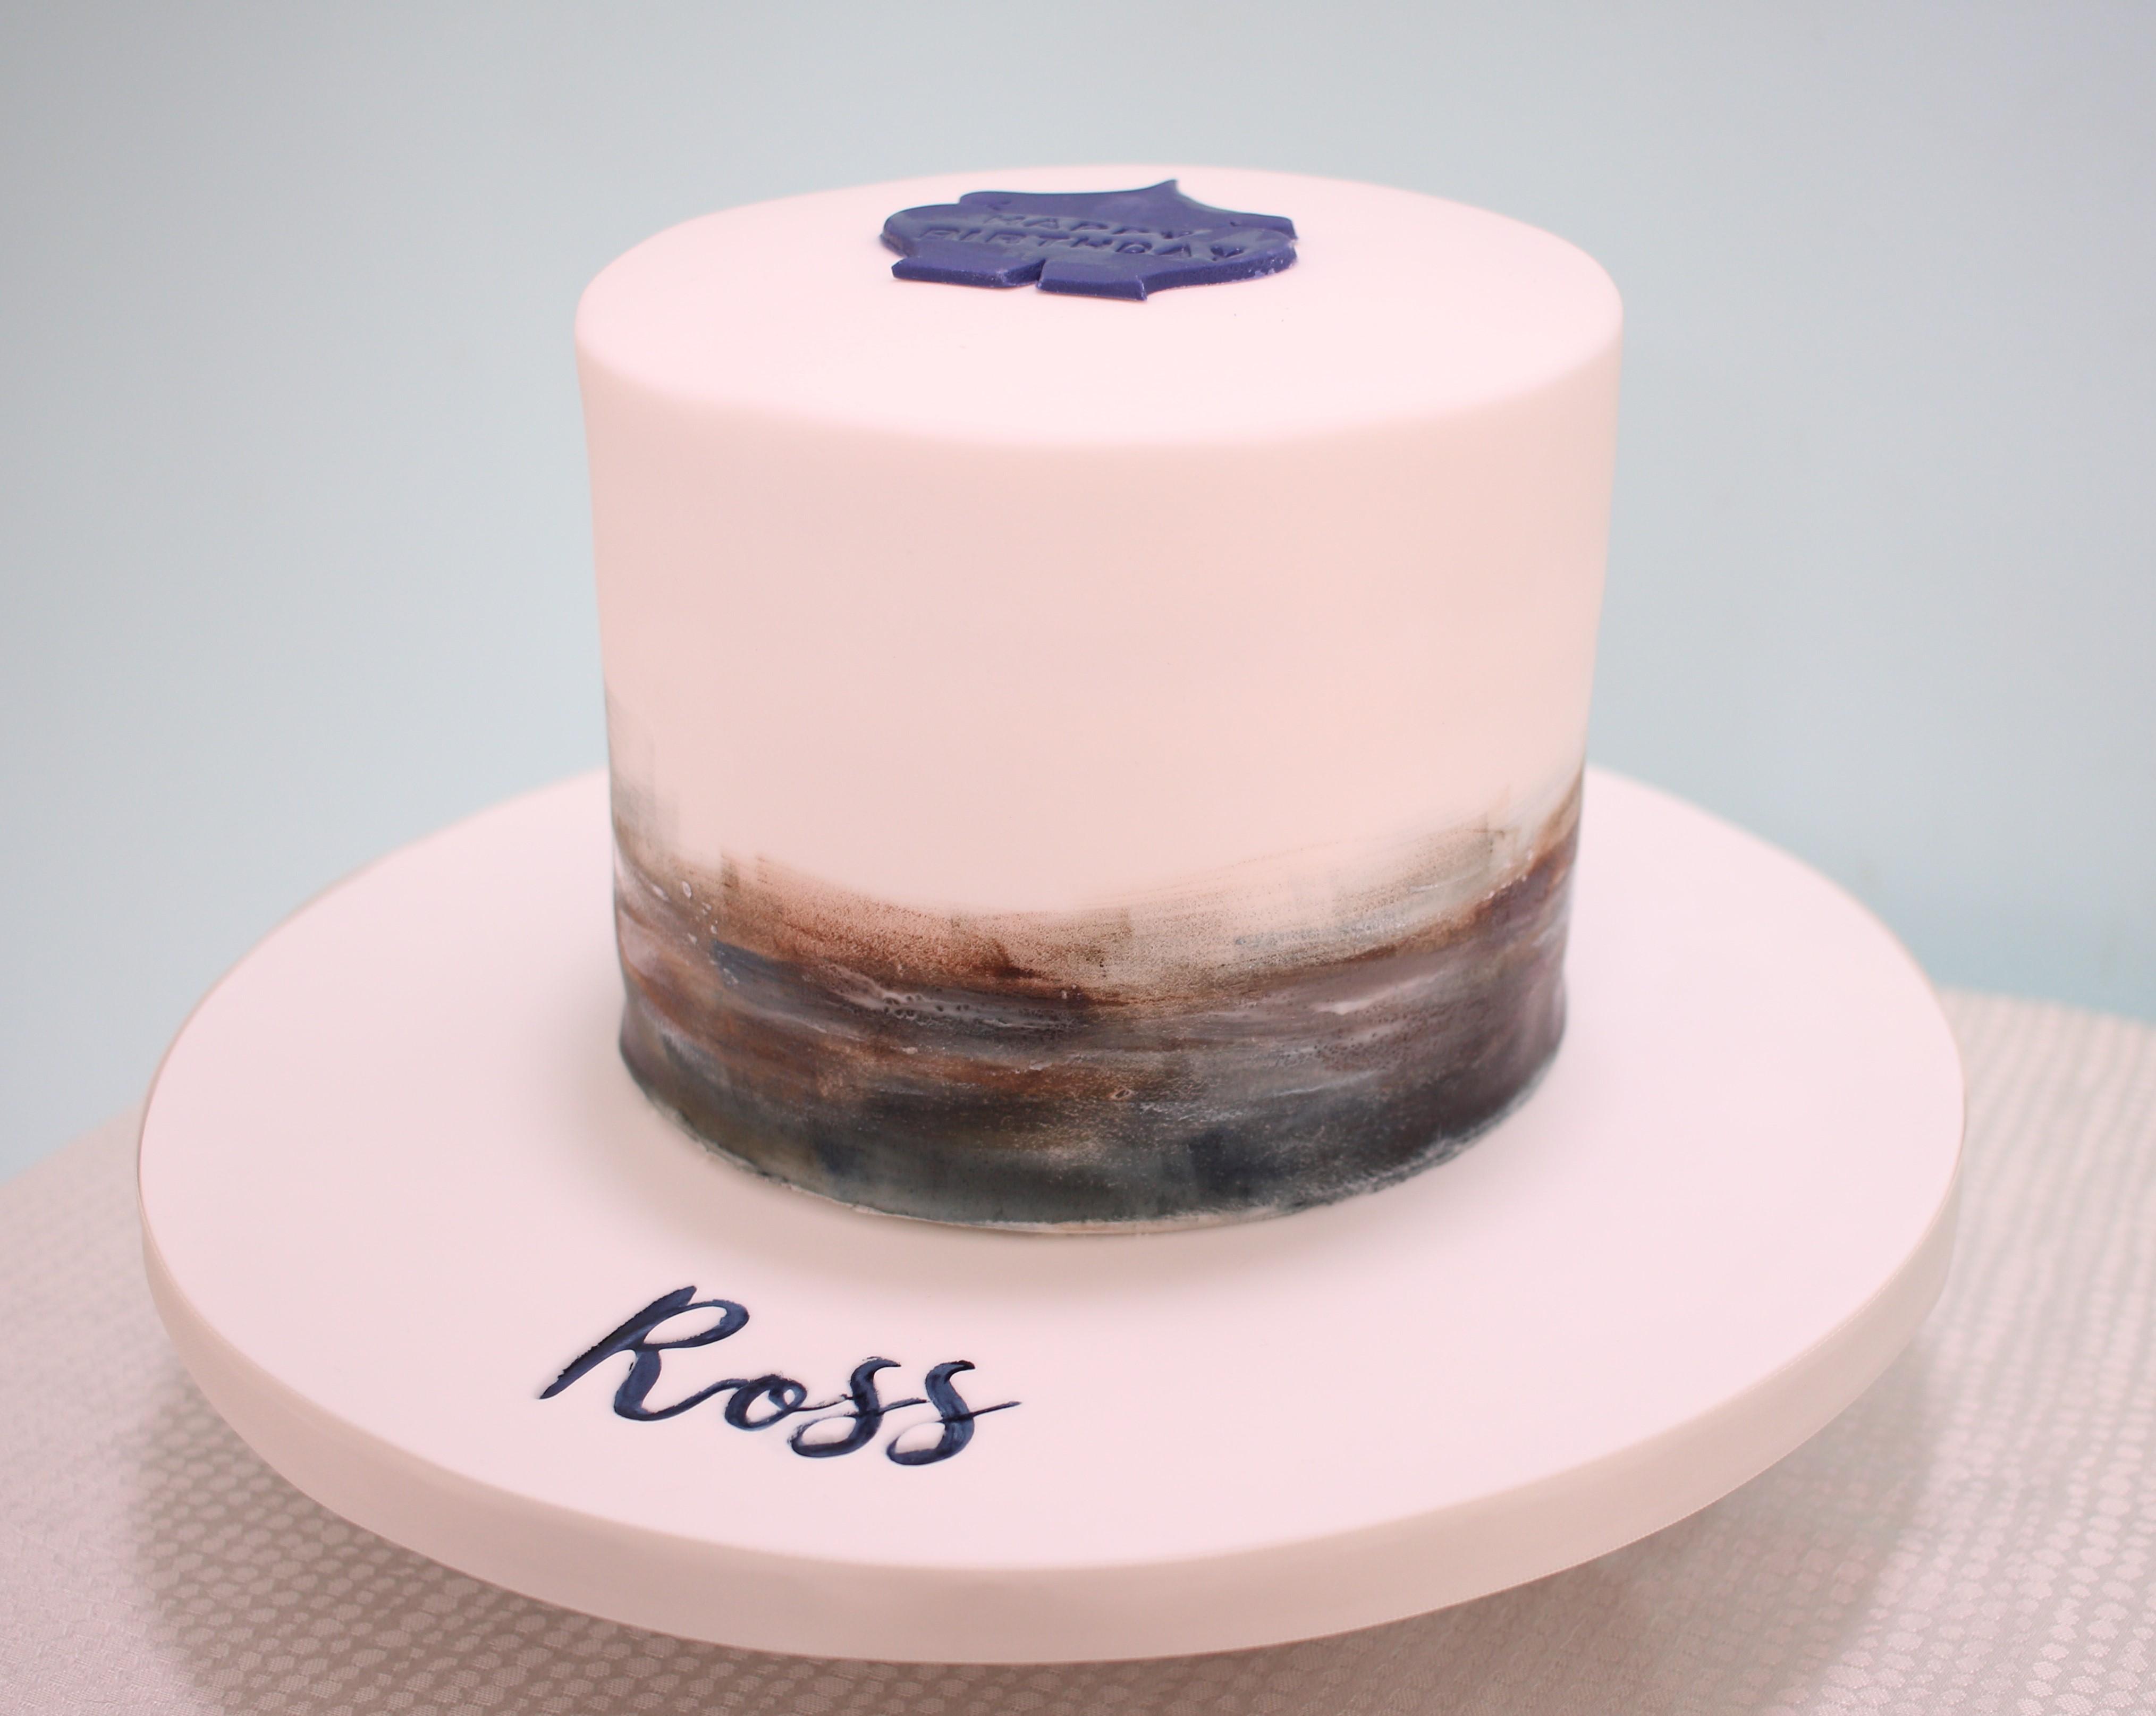 Painted fondant cake